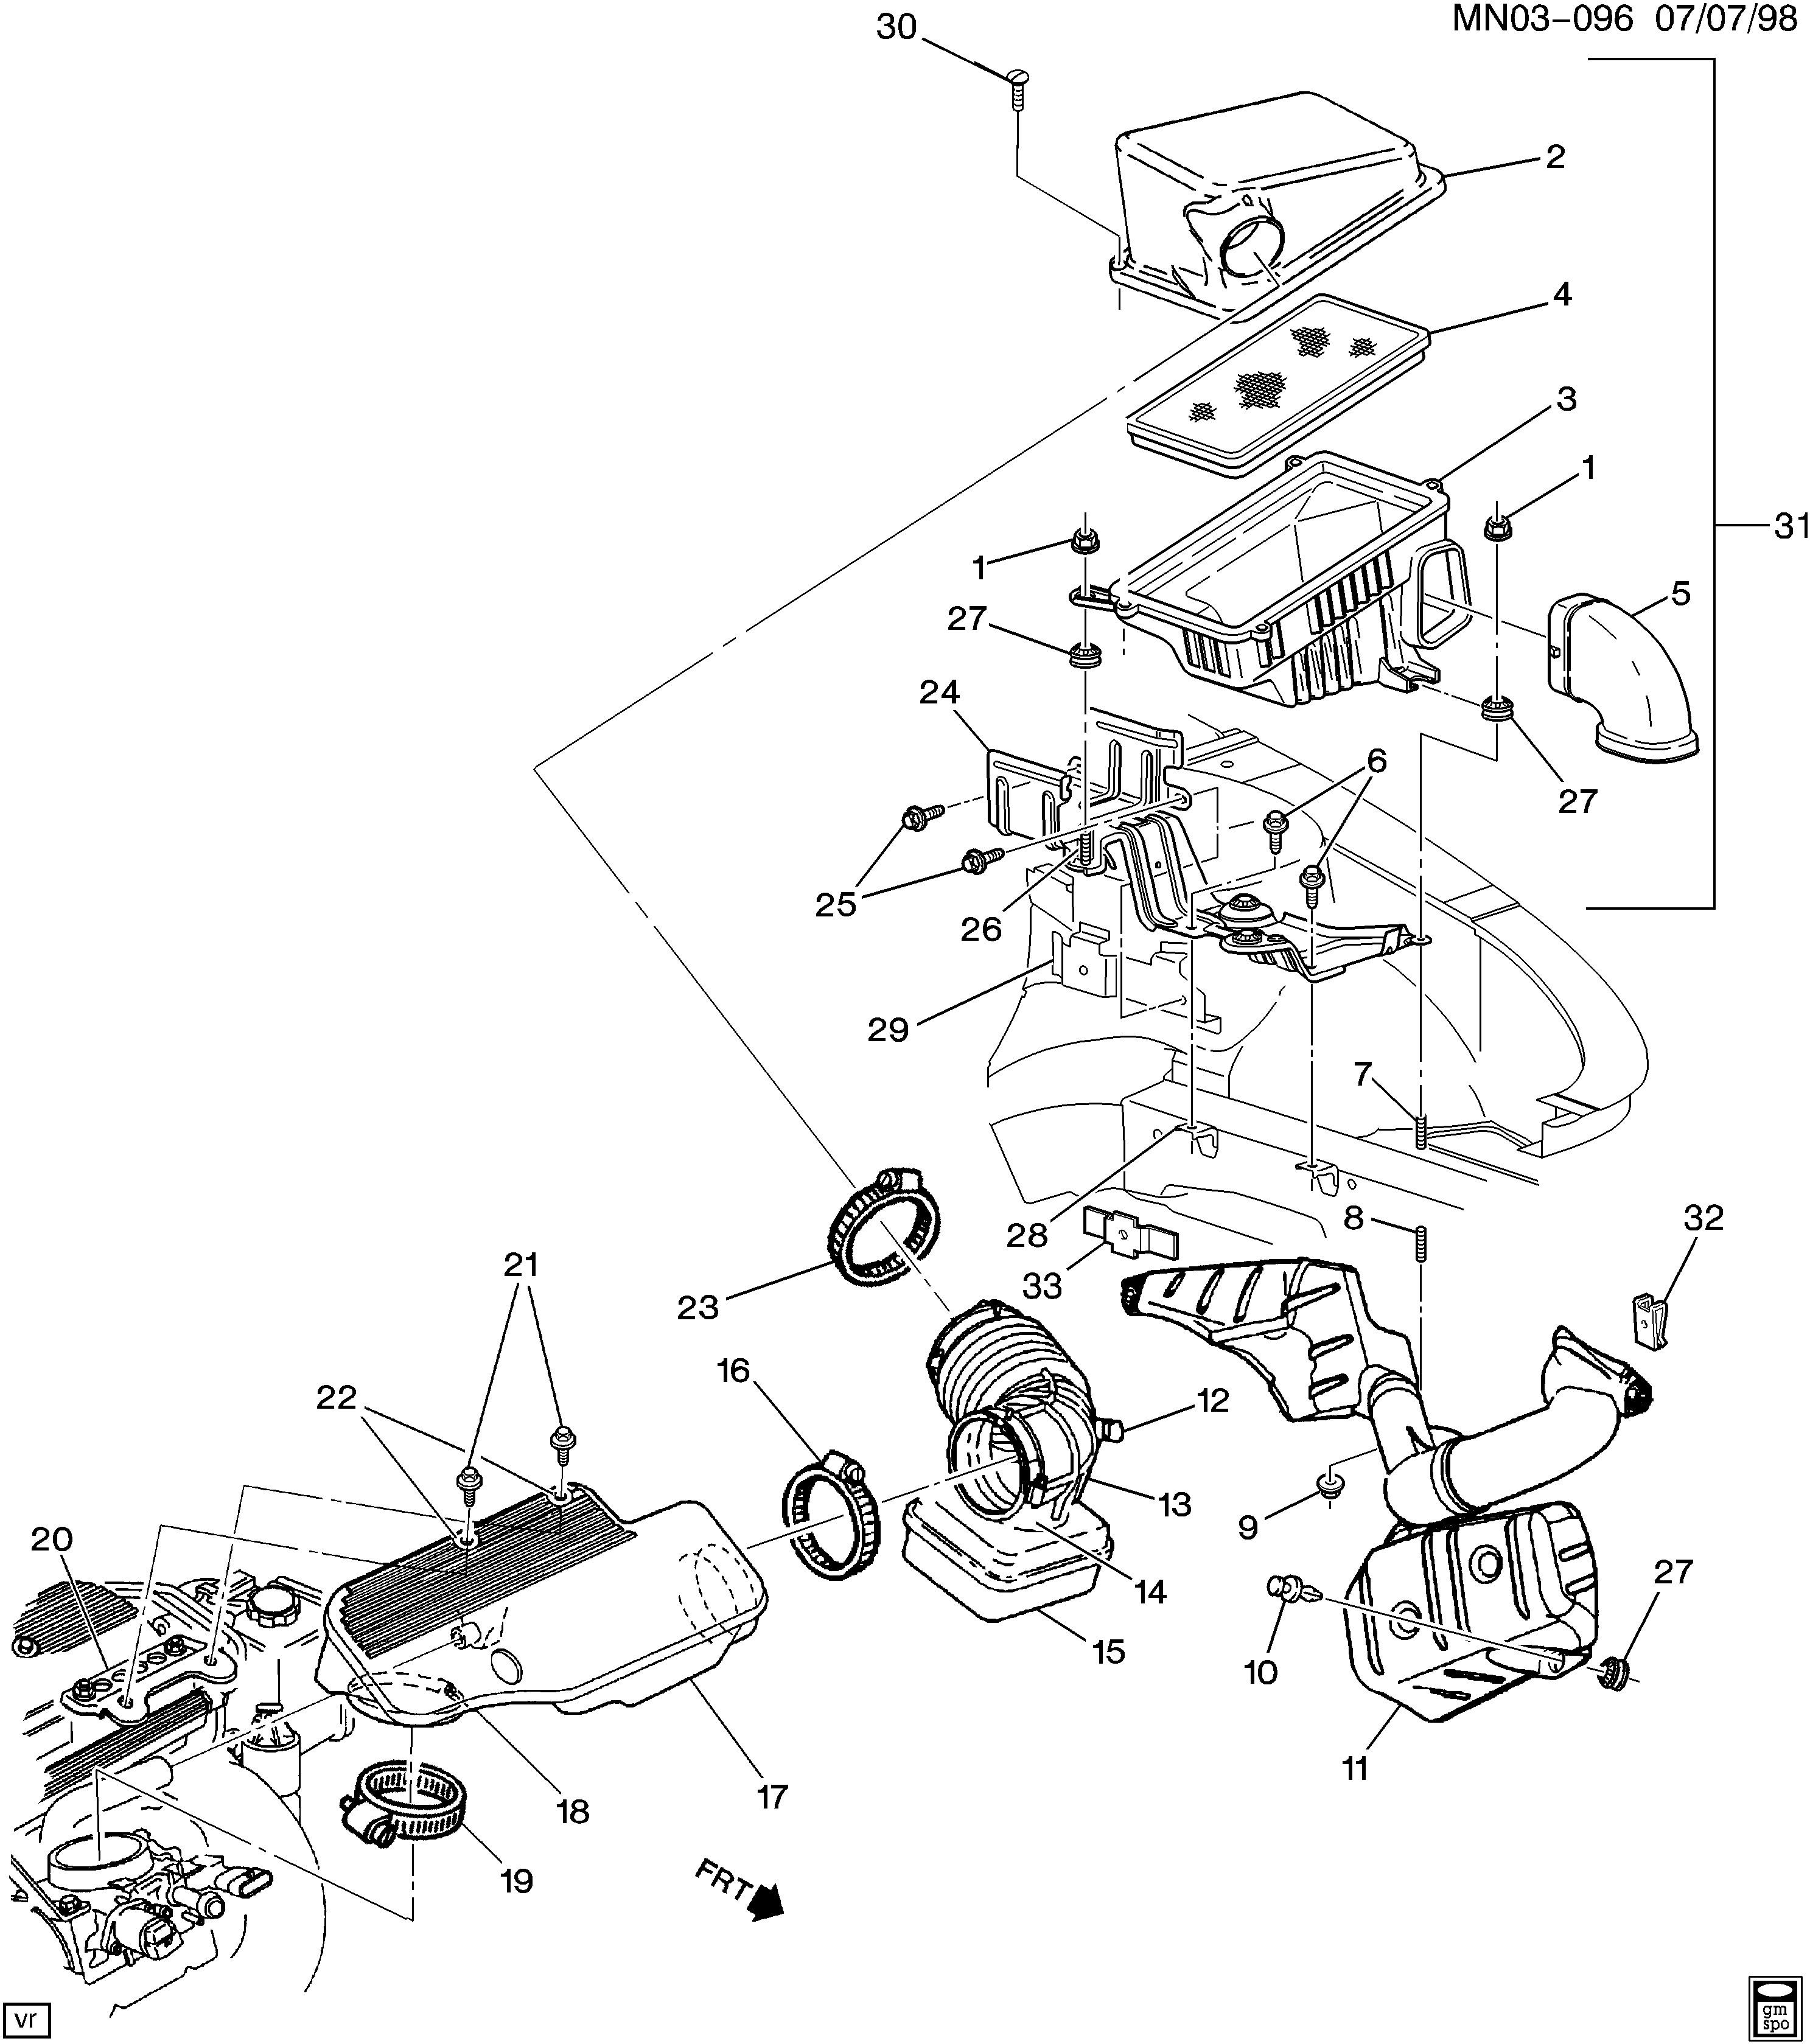 Air Intake System Diagram Pontiac Grand Am N Air Intake System Ld9 2 4t Epc Line Of Air Intake System Diagram